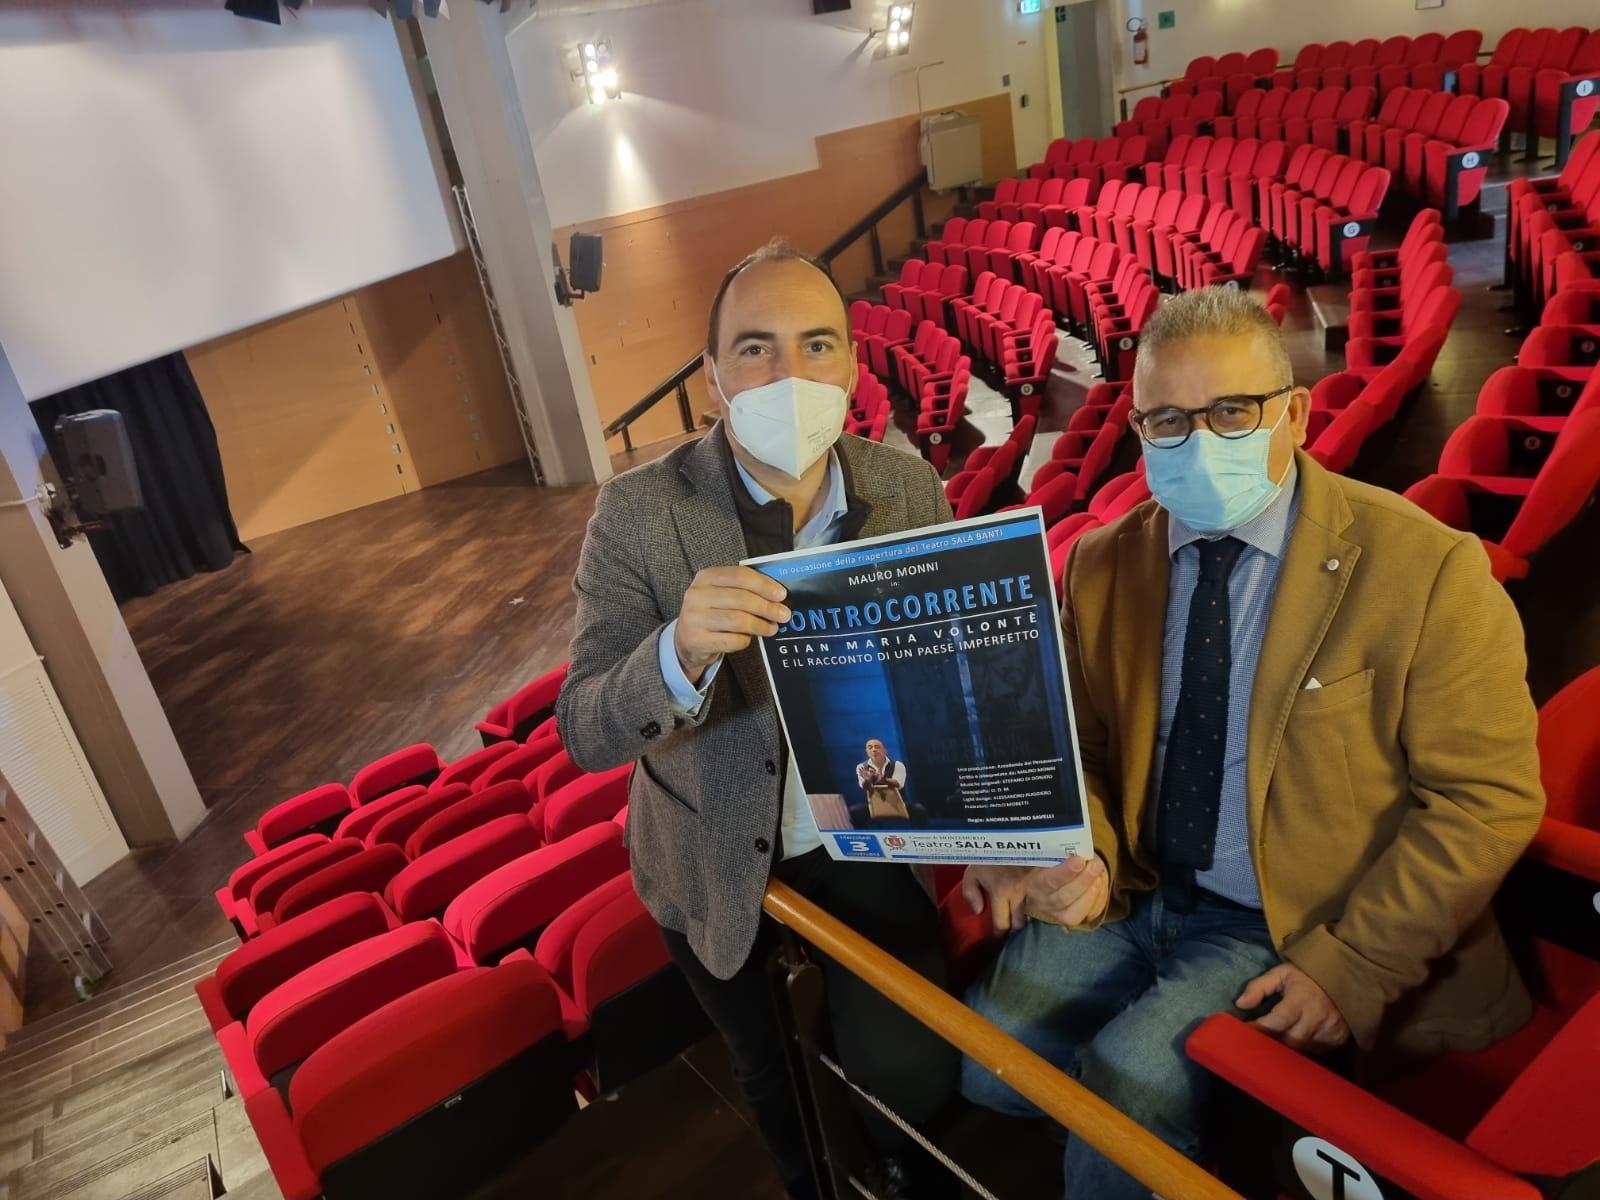 Teatro banti 21